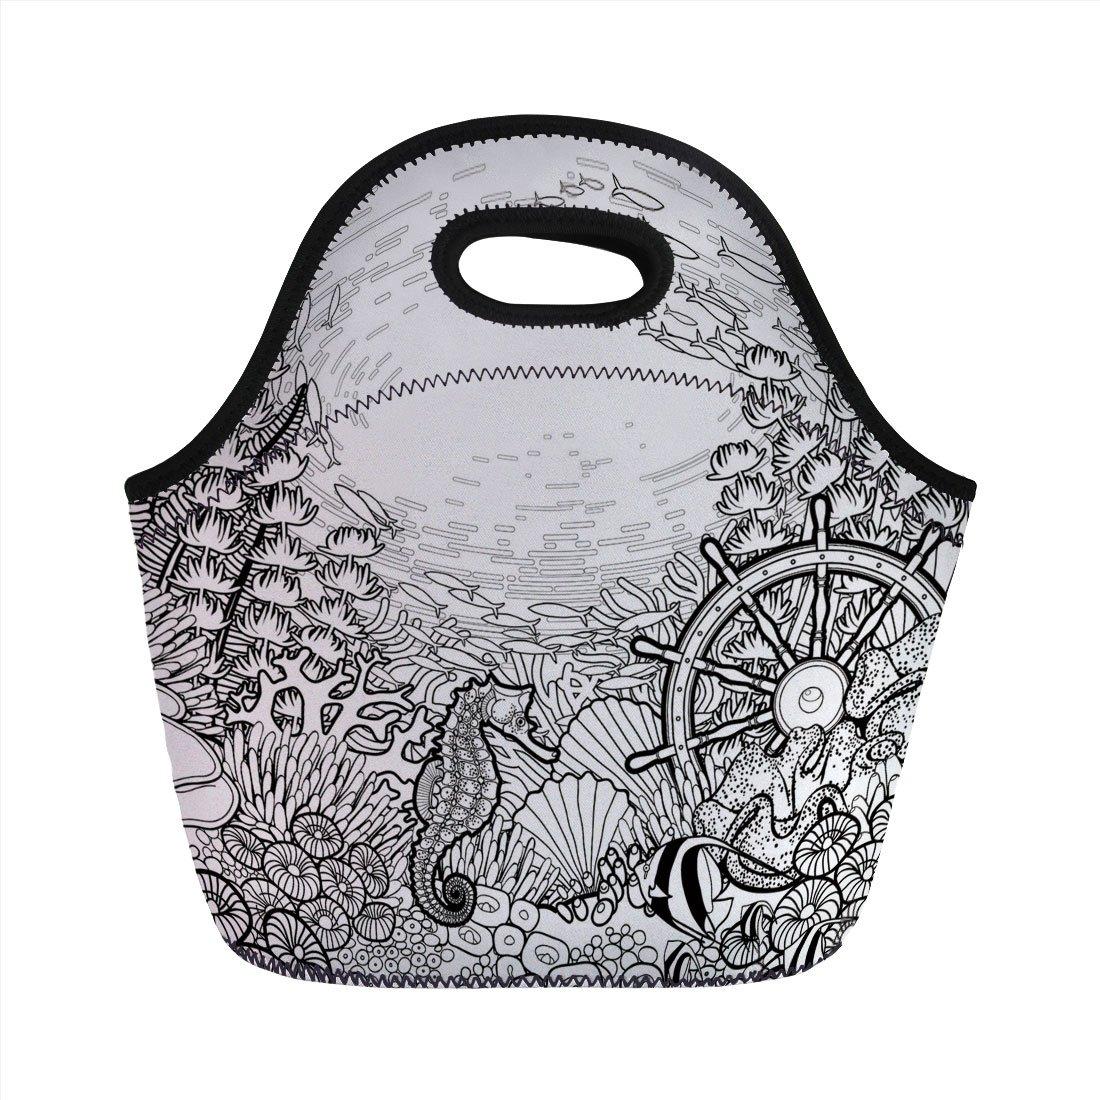 1100x1100 Neoprene Lunch Bag, Aquarium, Graphic Coral Reef